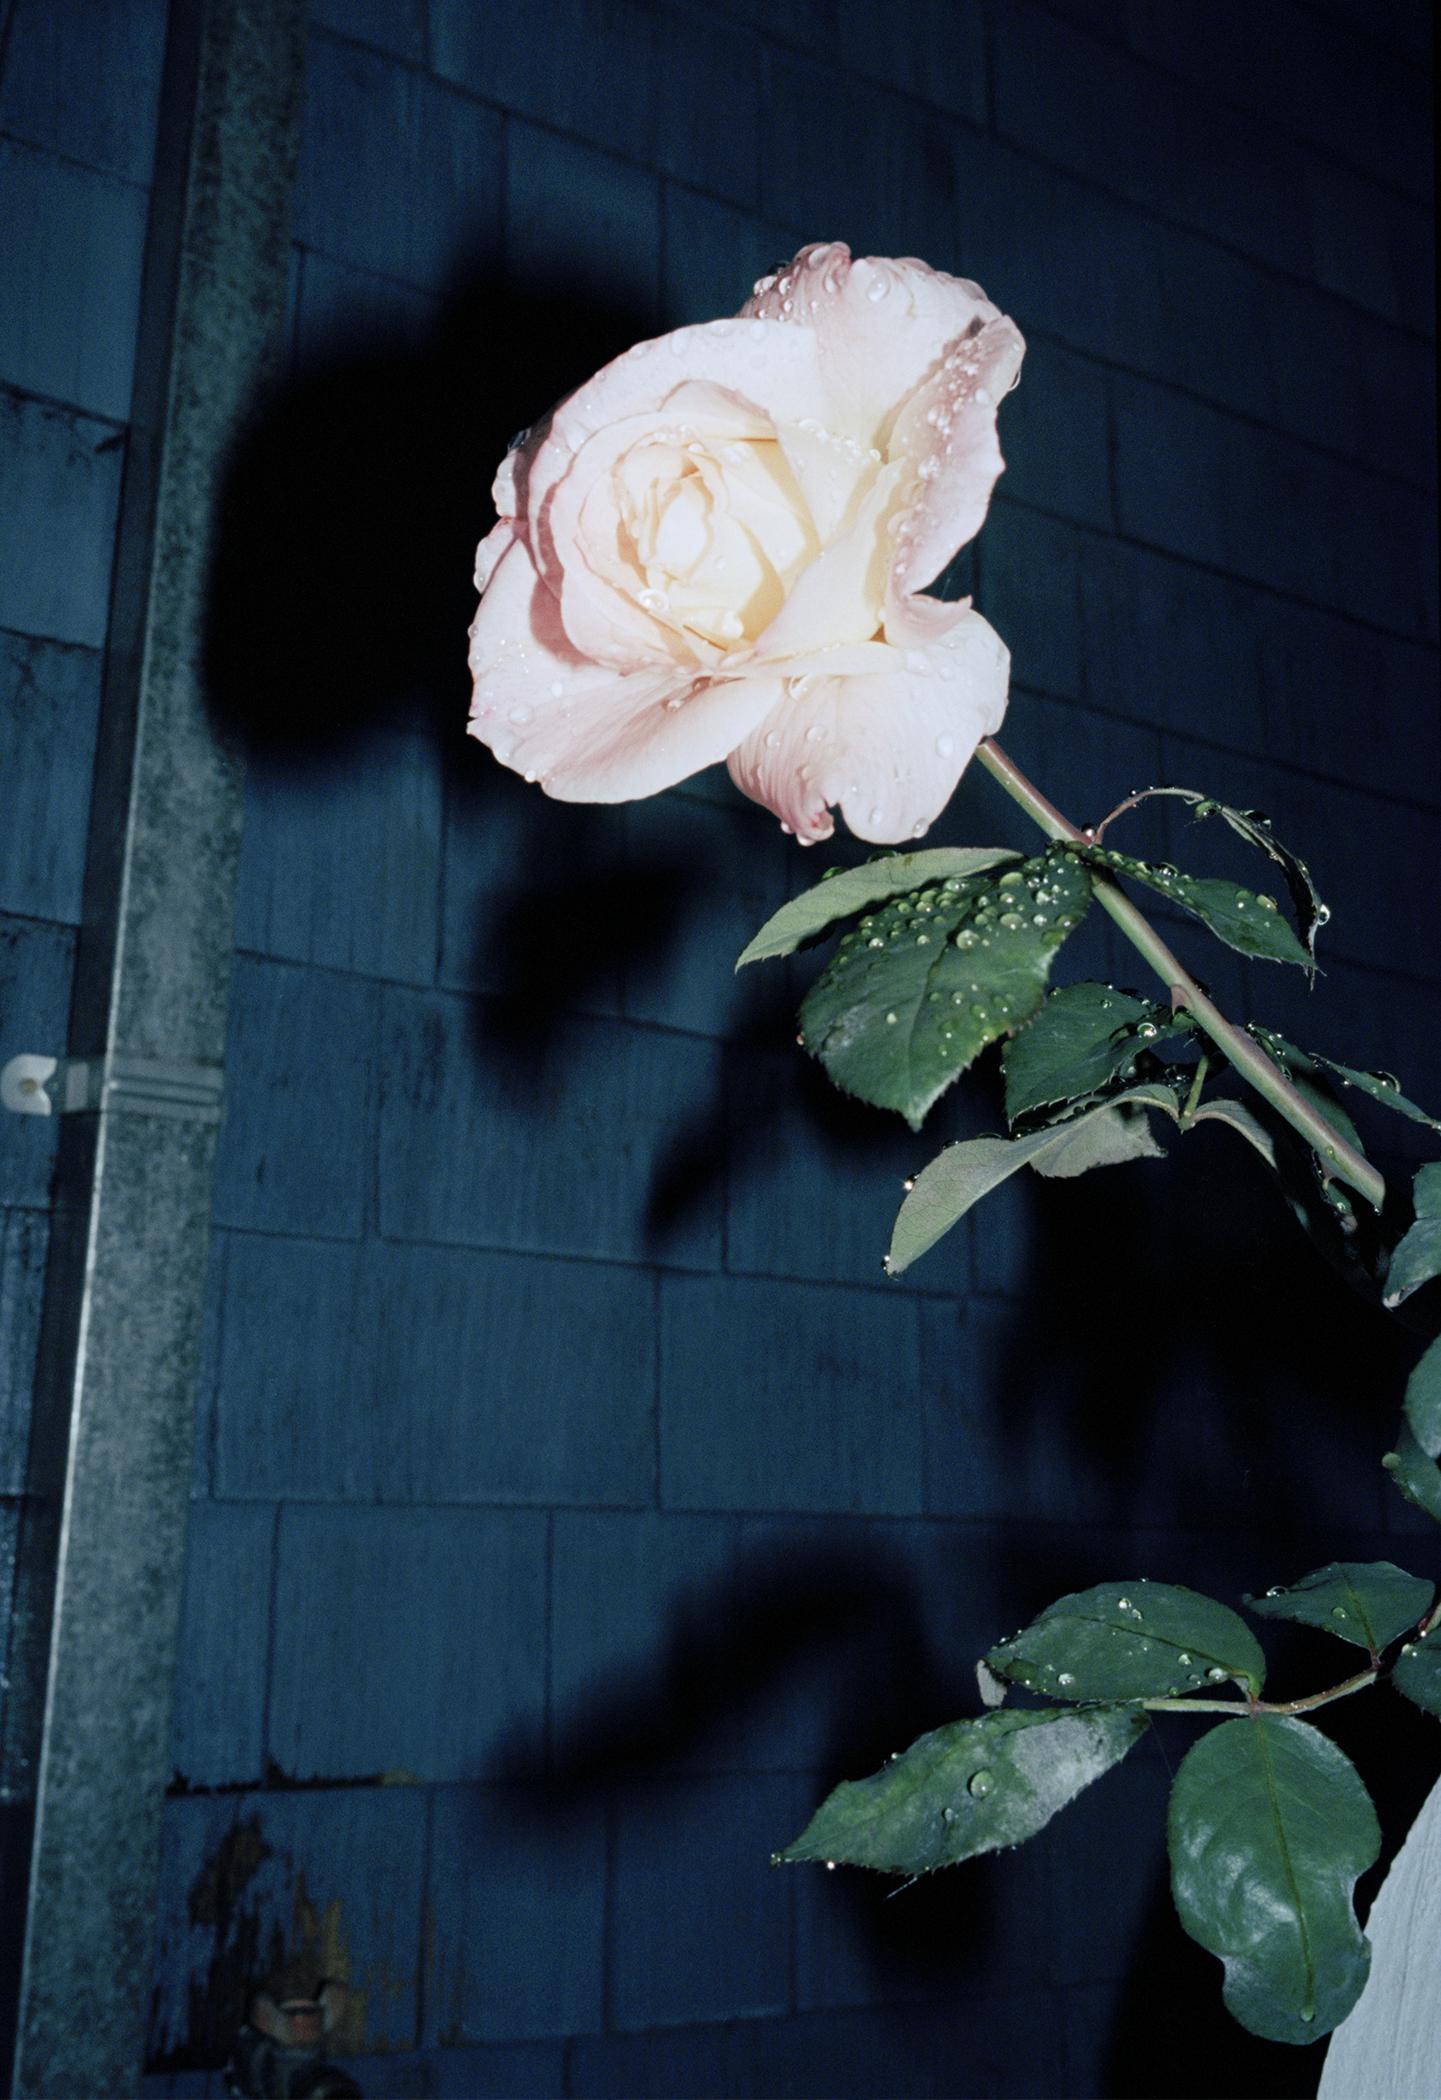 rose.jpg